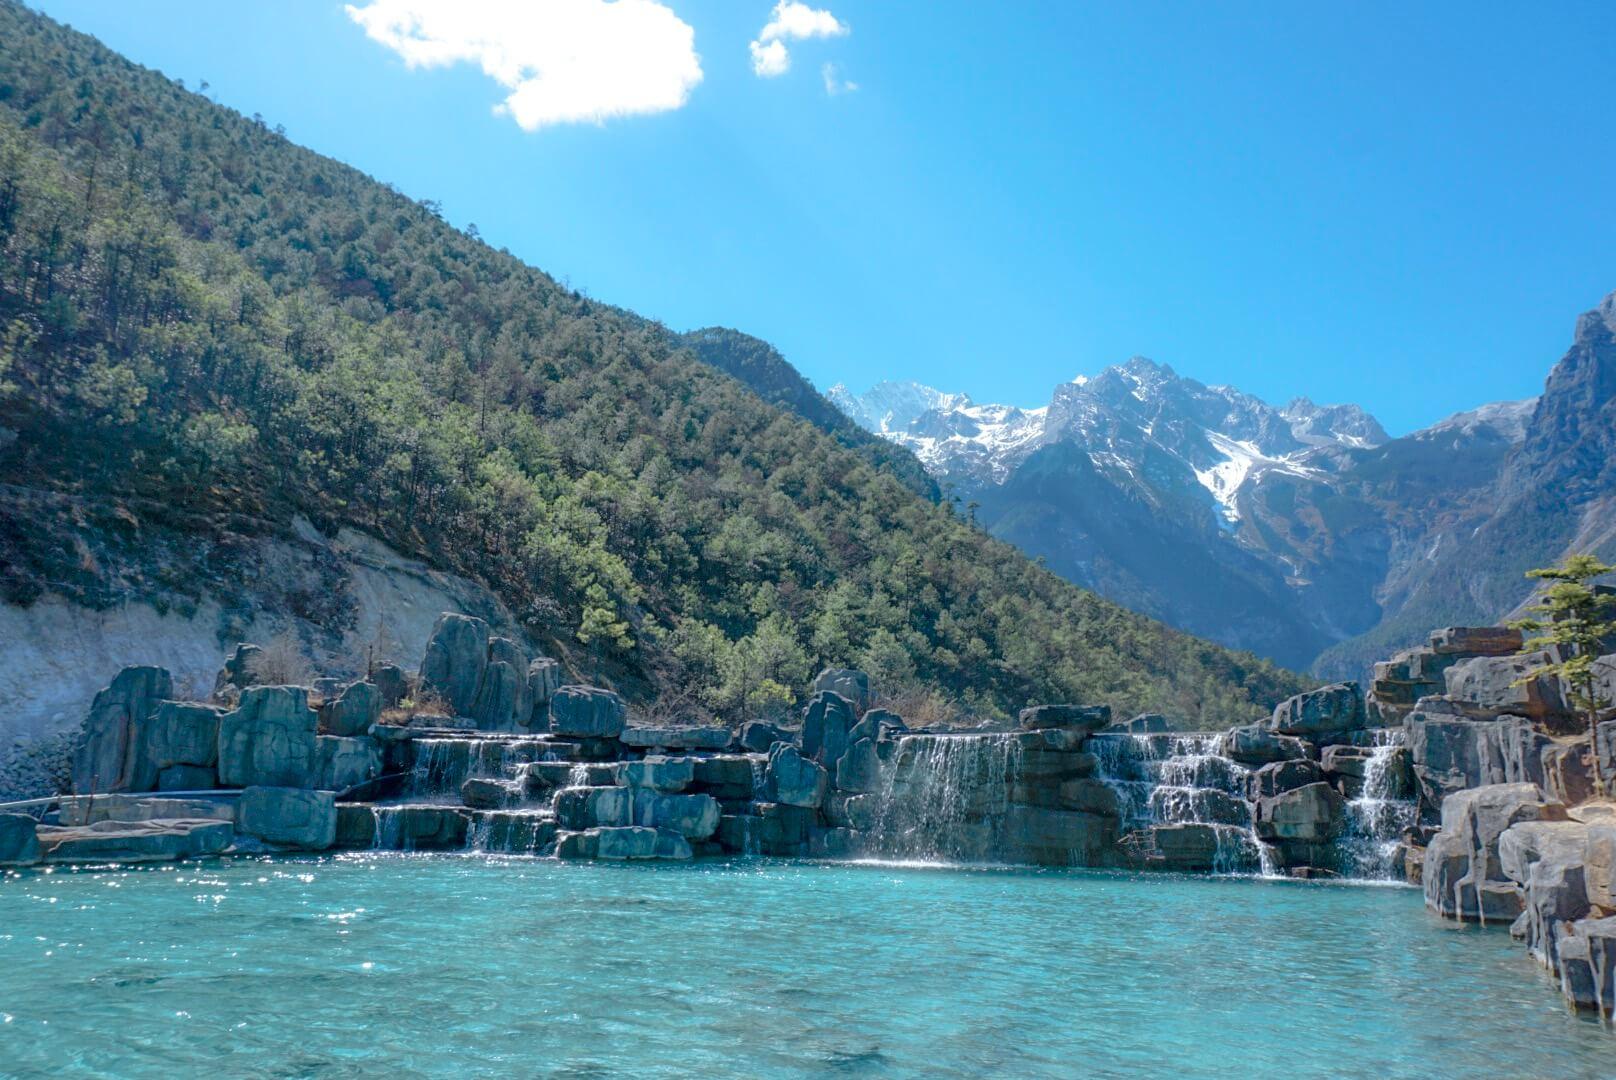 cascades et eau turquoise du lac blue moon valley chine Yunnan blog